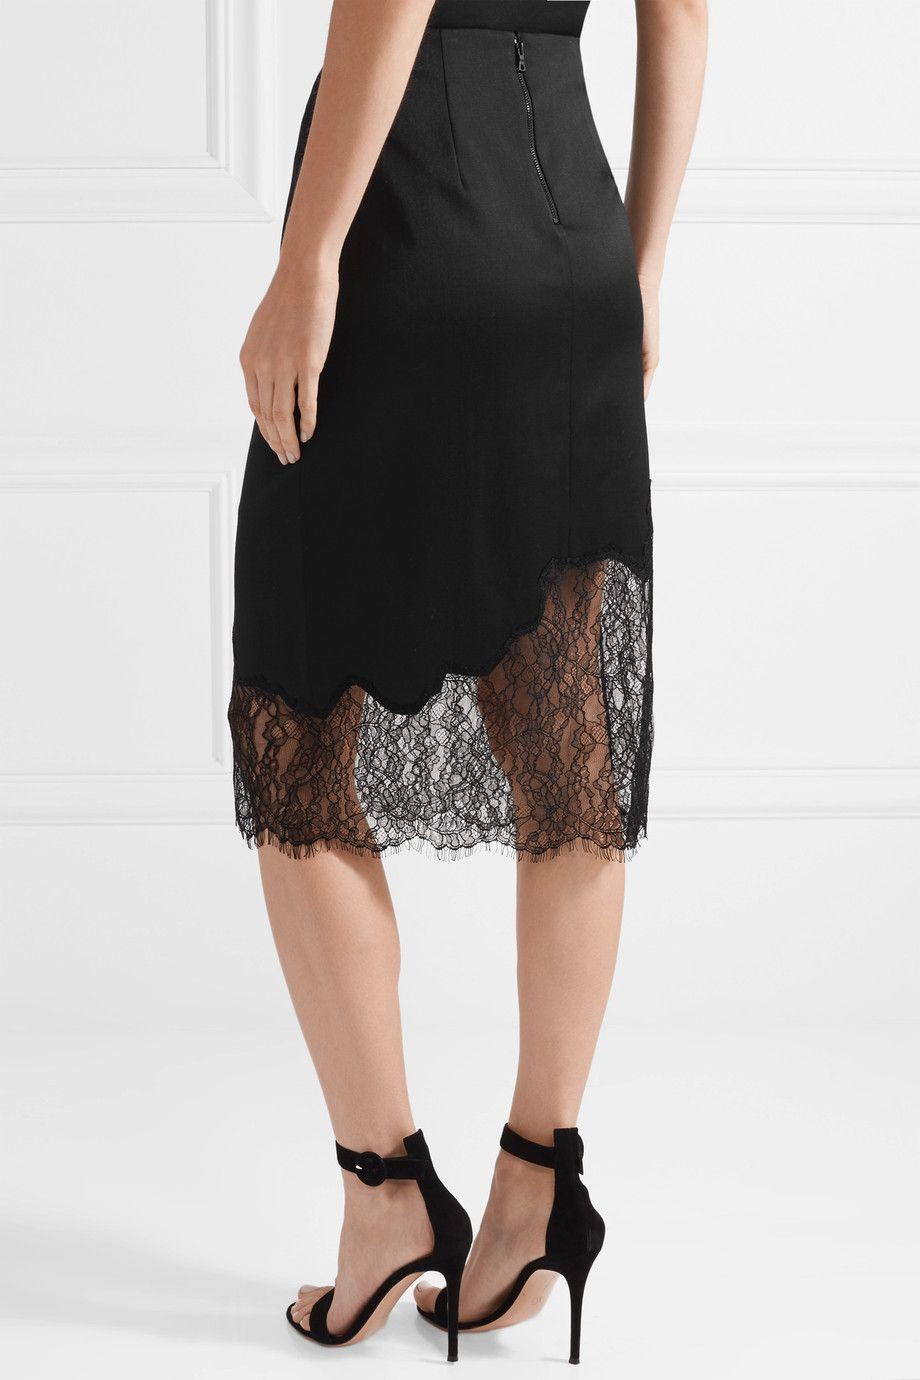 Alice + Olivia   Evana lace-paneled wool-blend crepe skirt   NET-A-PORTER.COM